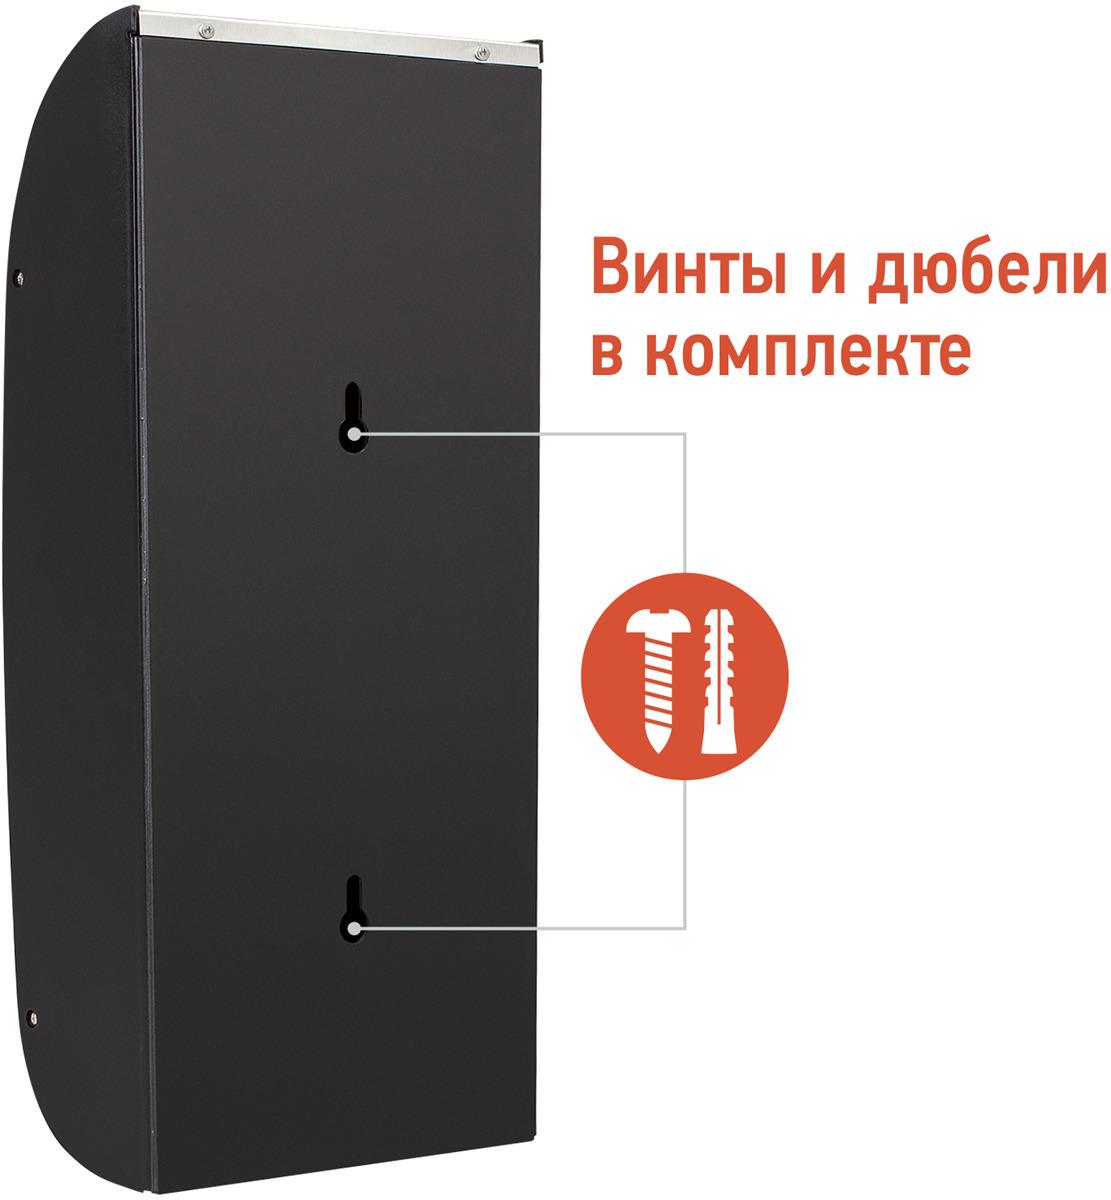 Держатель для пакетов Wonder Worker, цвет: серый металлик, 17 х 9 х 39 см